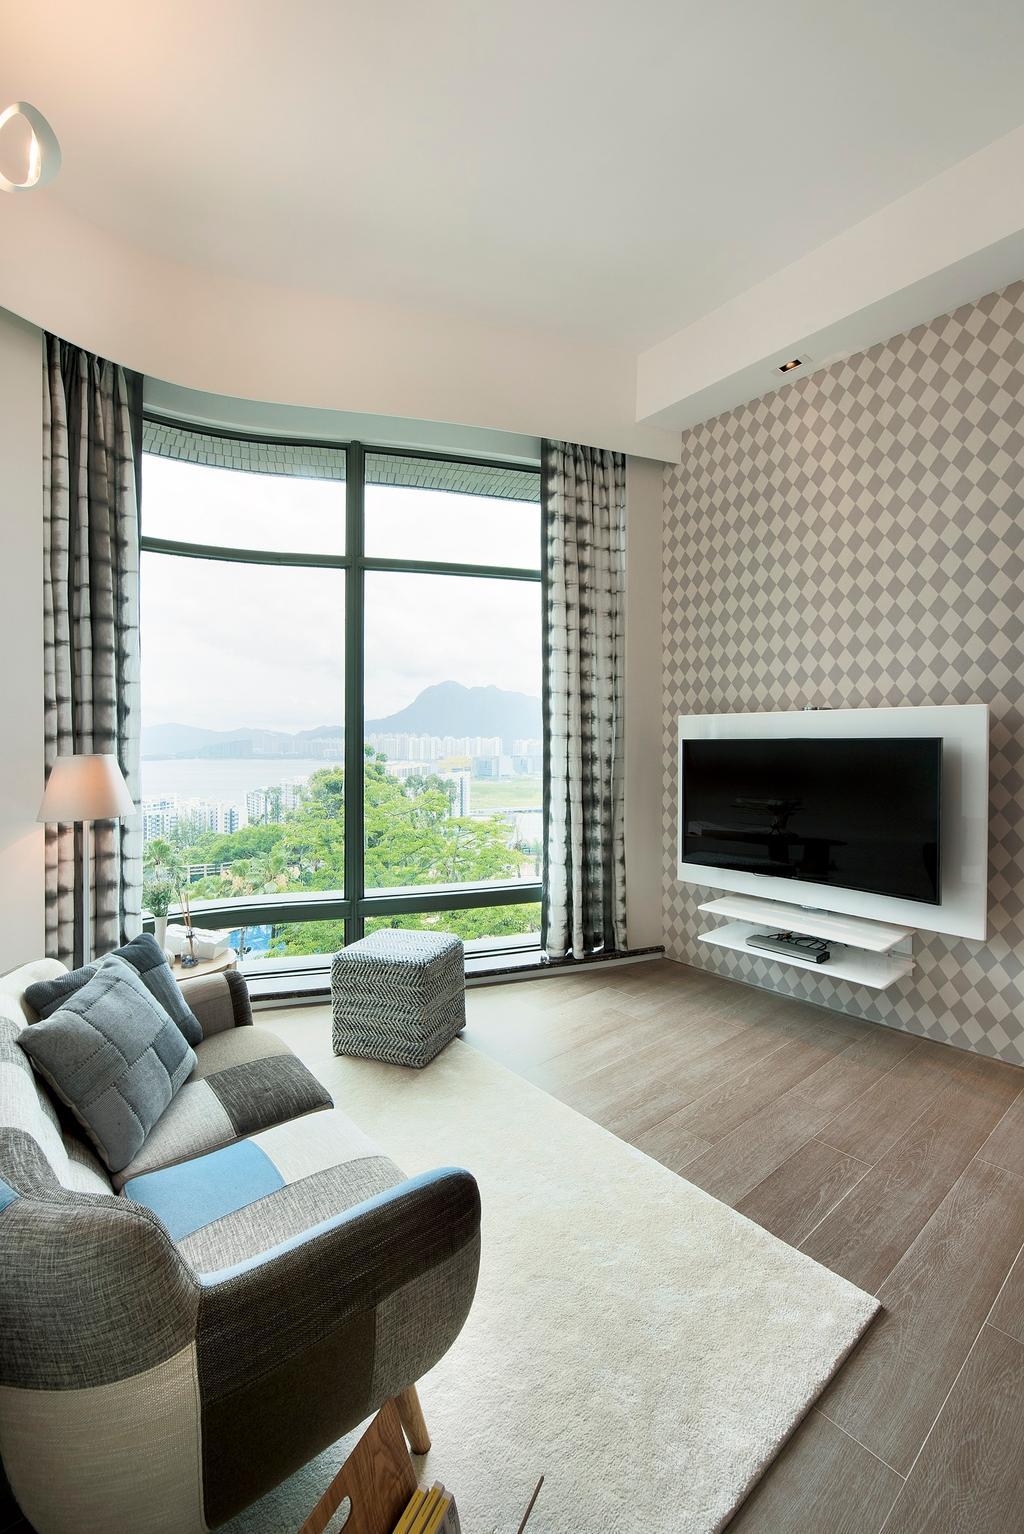 摩登, 私家樓, 客廳, Deerhill Bay, 室內設計師, 畫斯室內設計, 當代, 北歐, Indoors, Interior Design, Furniture, Ottoman